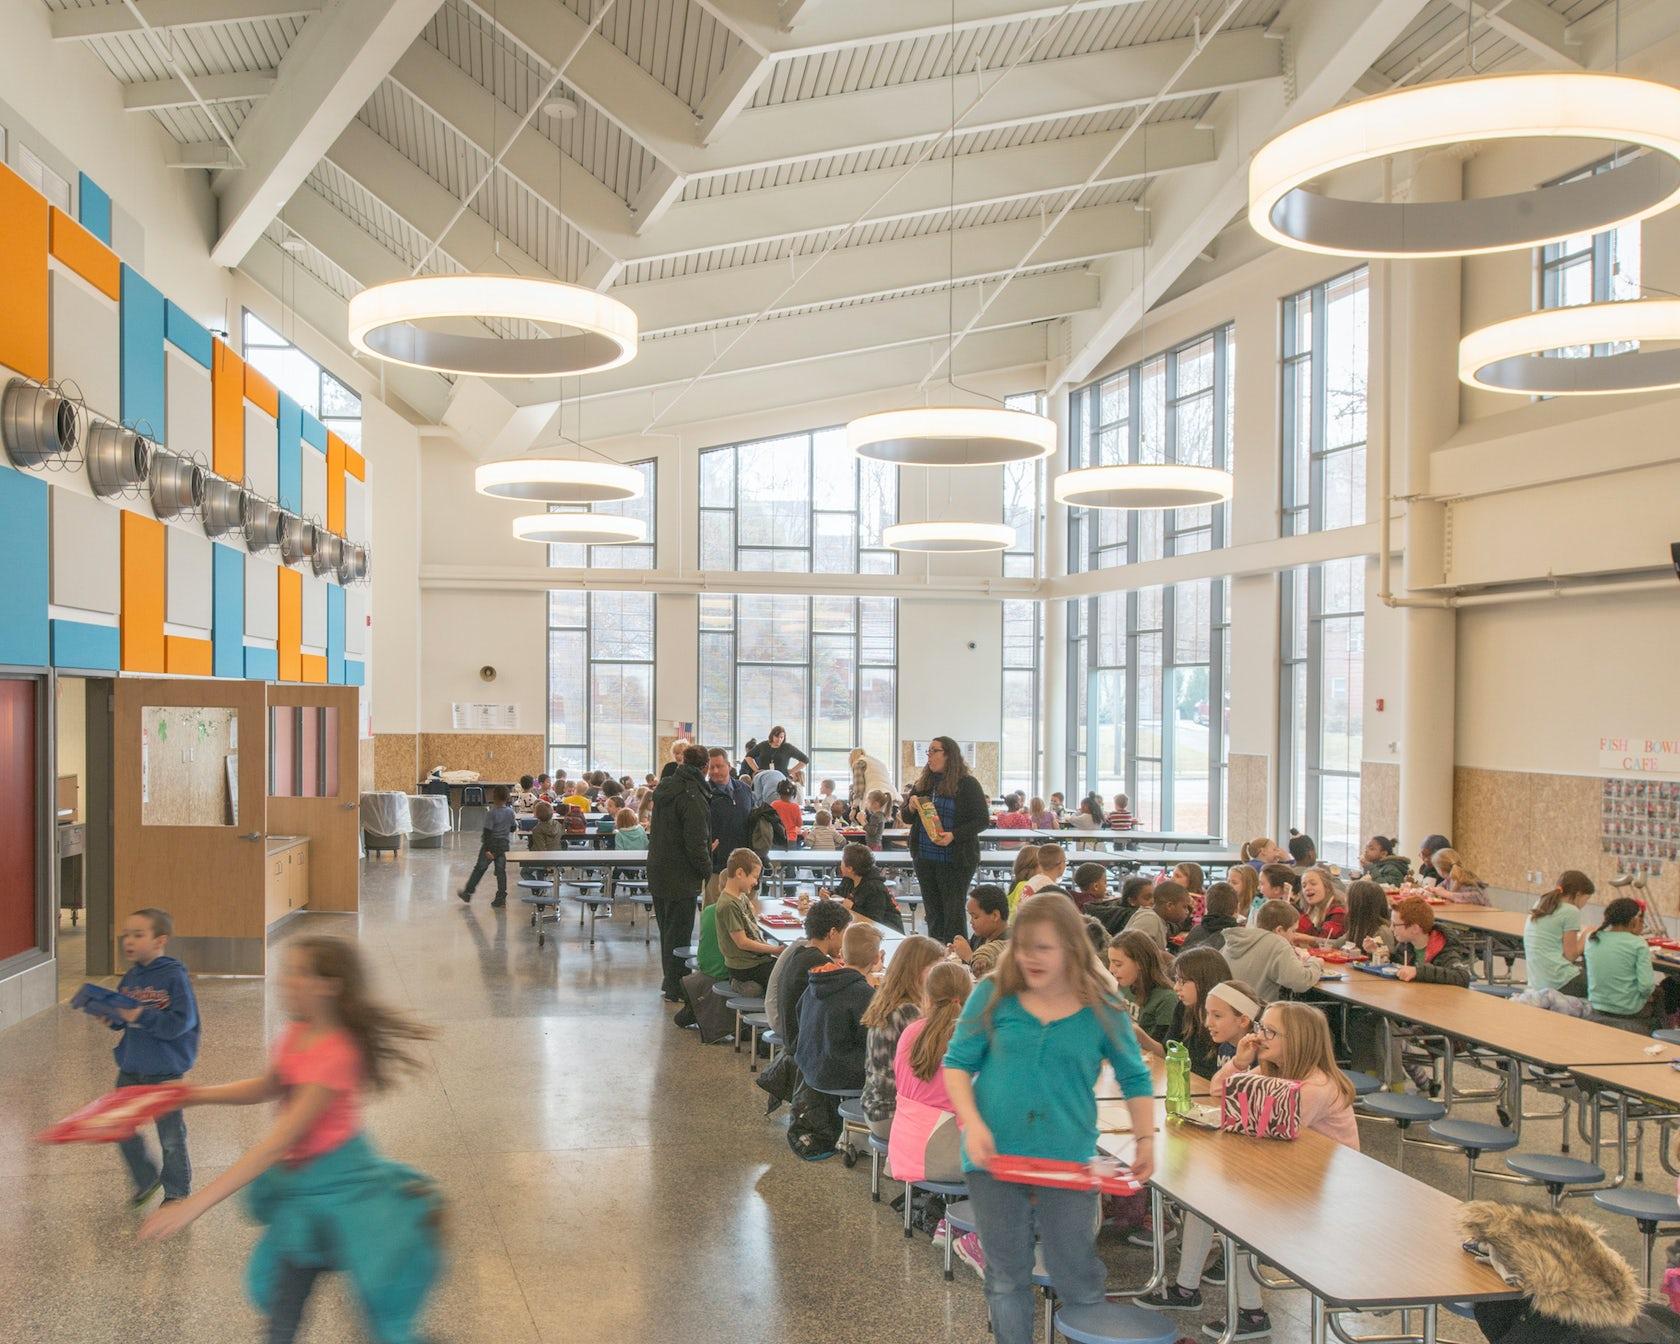 binghamton city school district new macarthur elementary school architizer. Black Bedroom Furniture Sets. Home Design Ideas